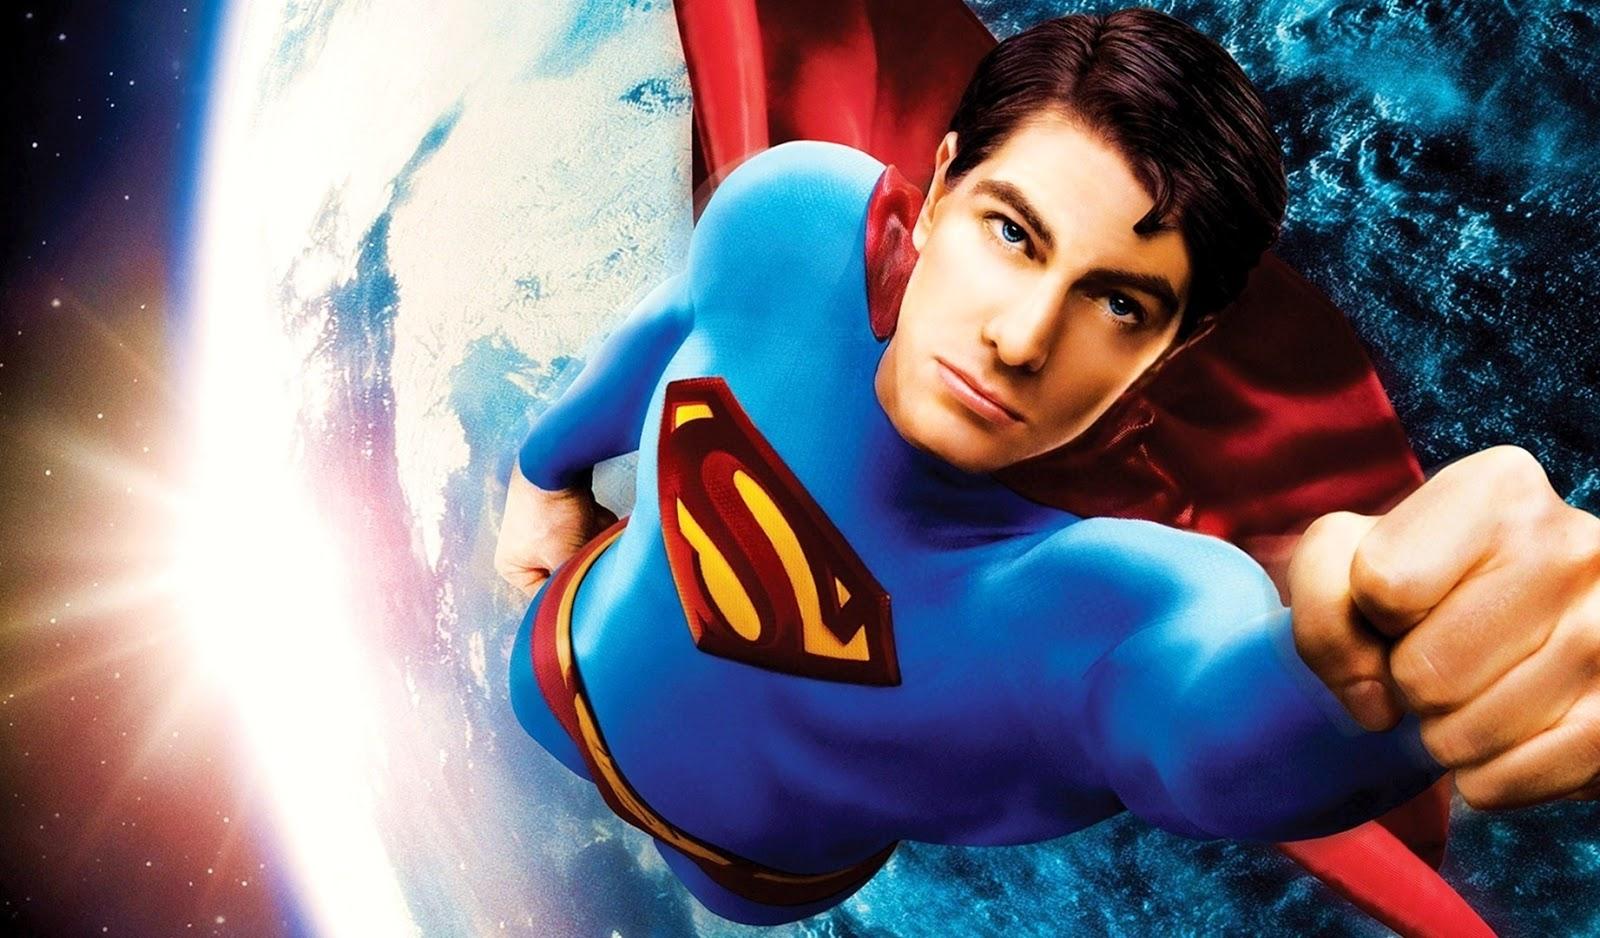 10 Kekuatan Superman Paling Konyol Kumpulan Berita Unik Aneh